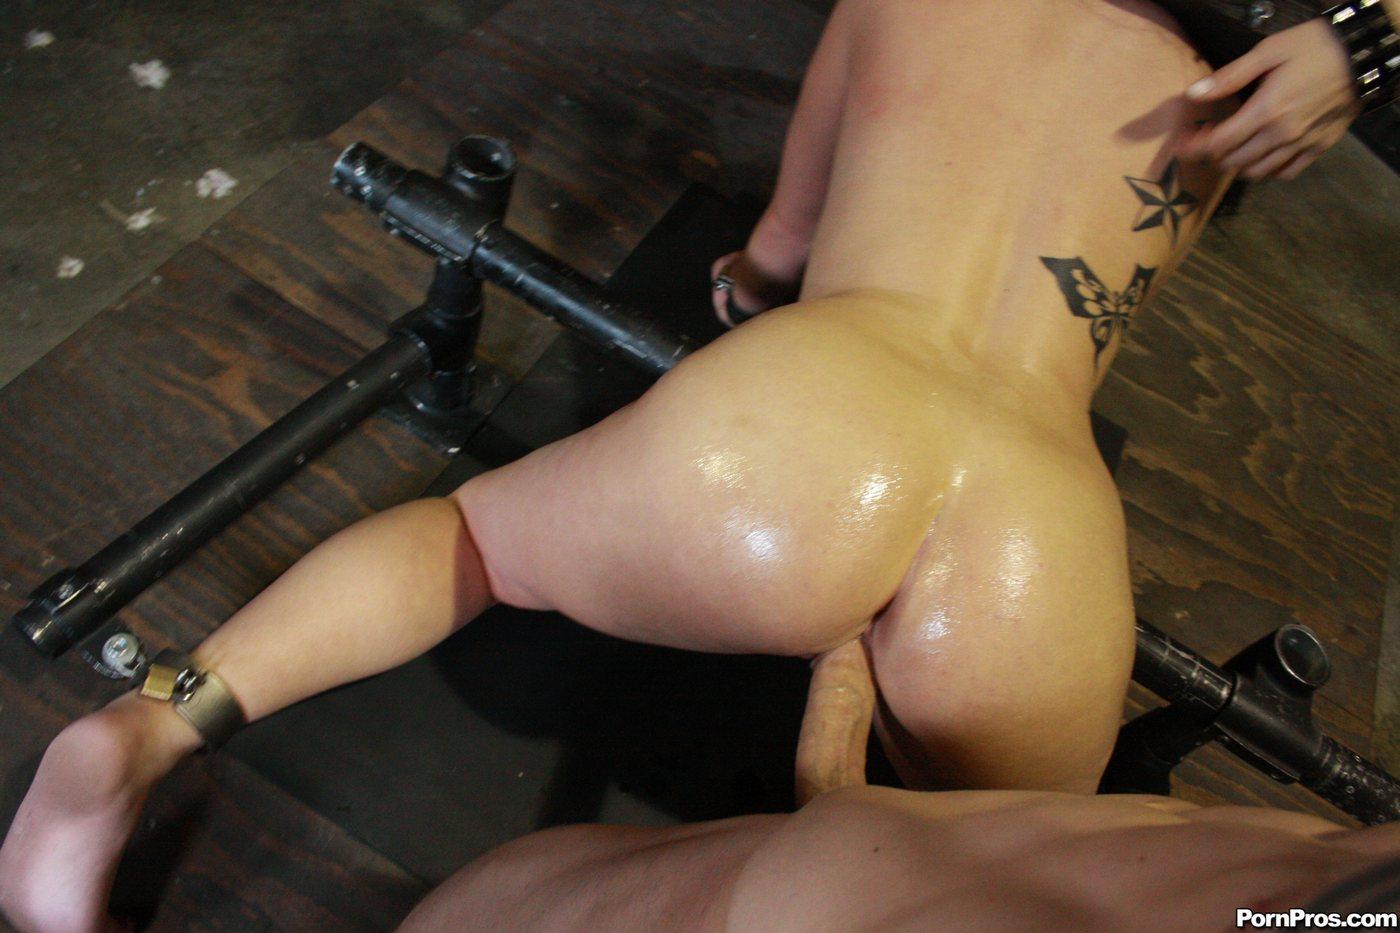 Ebony girl spank